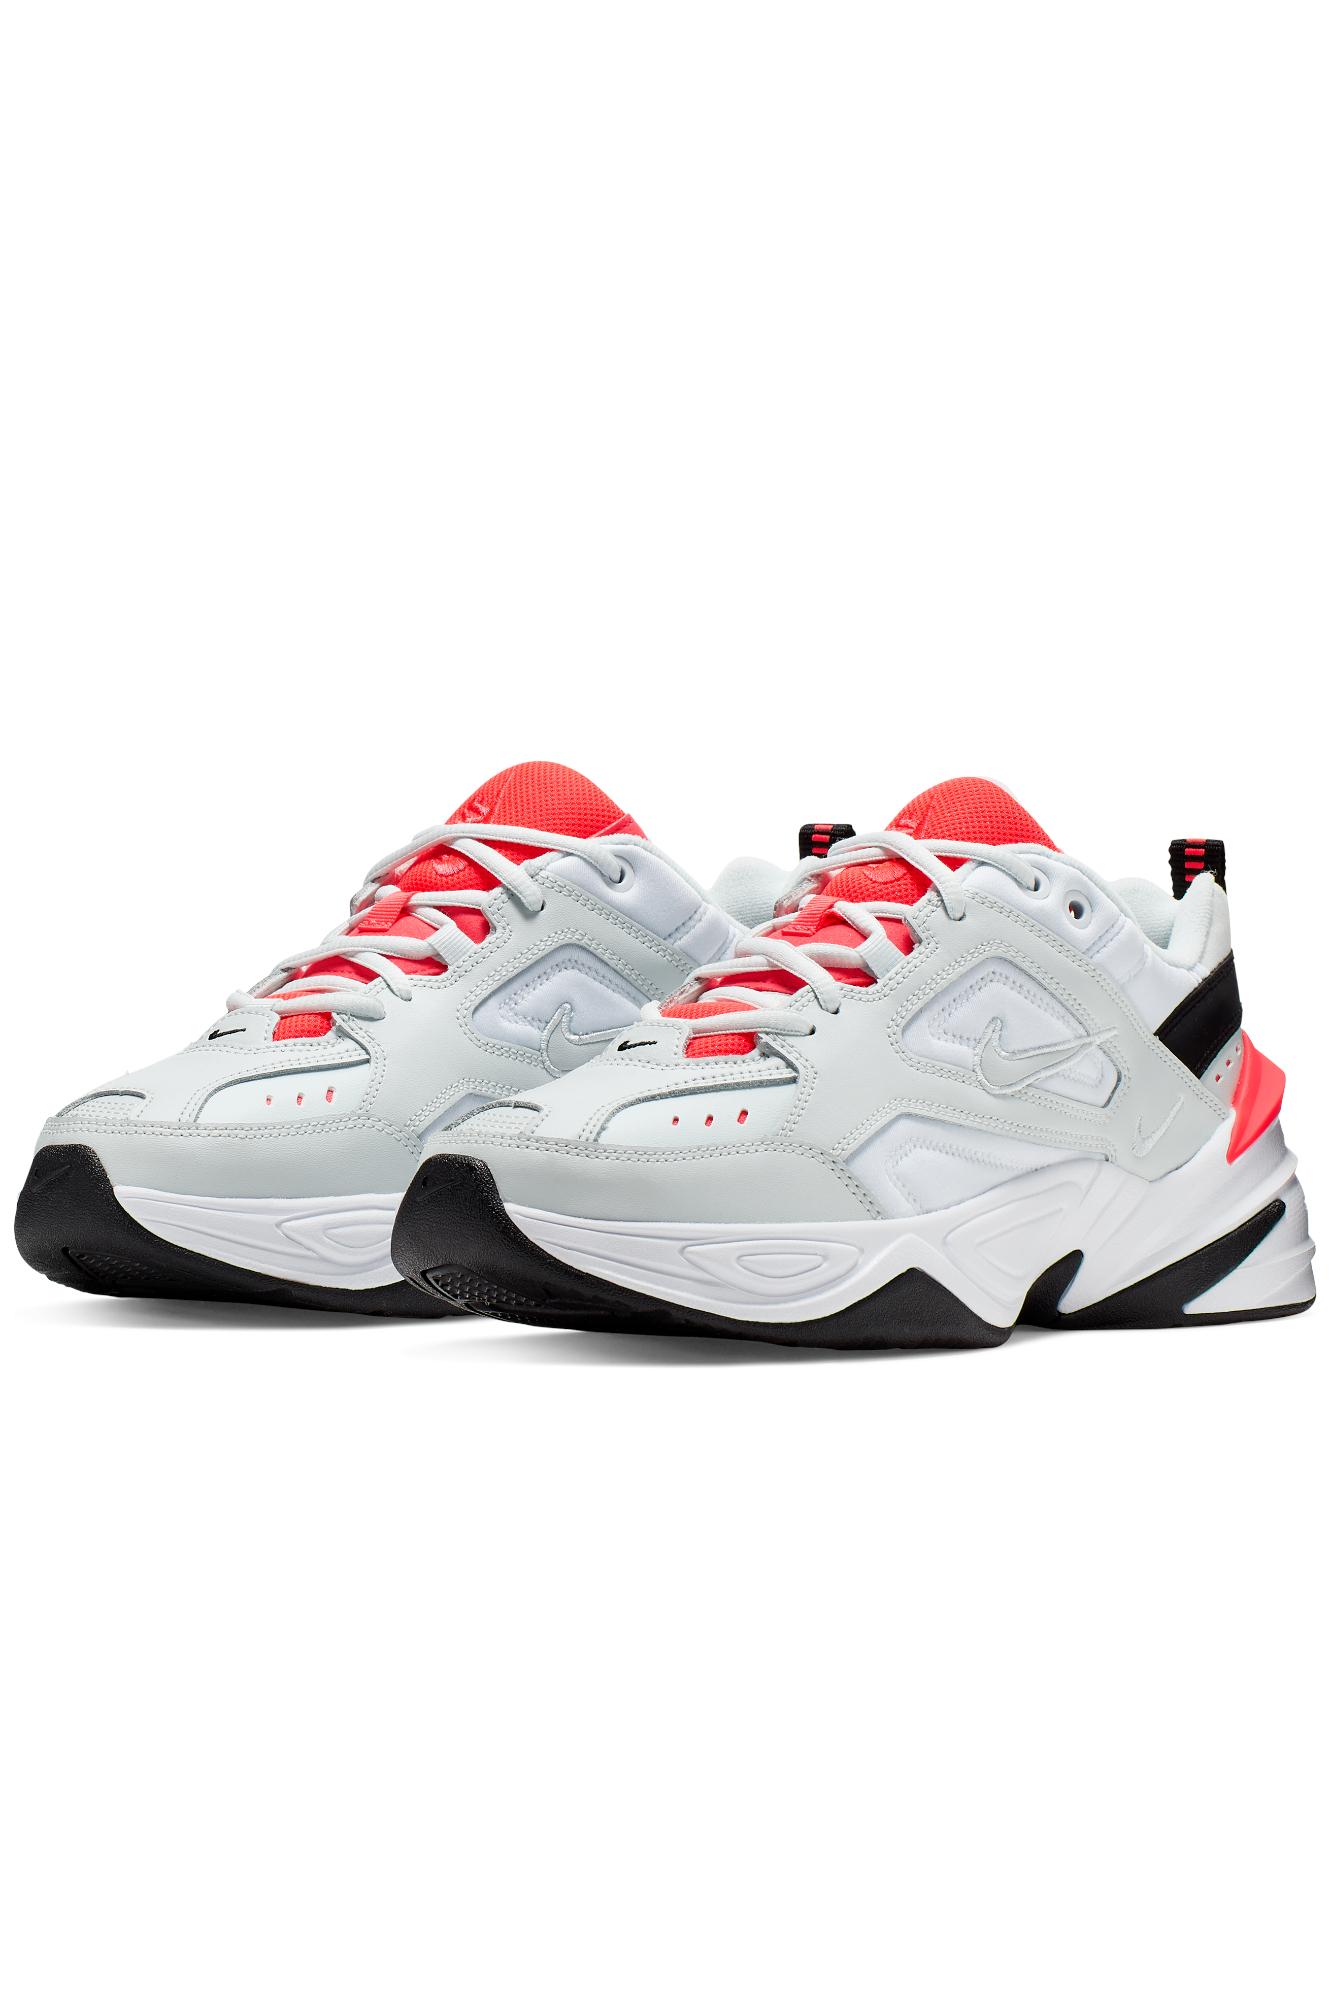 Buty Nike M2K Tekno AO3108 401 Na co dzień Buty